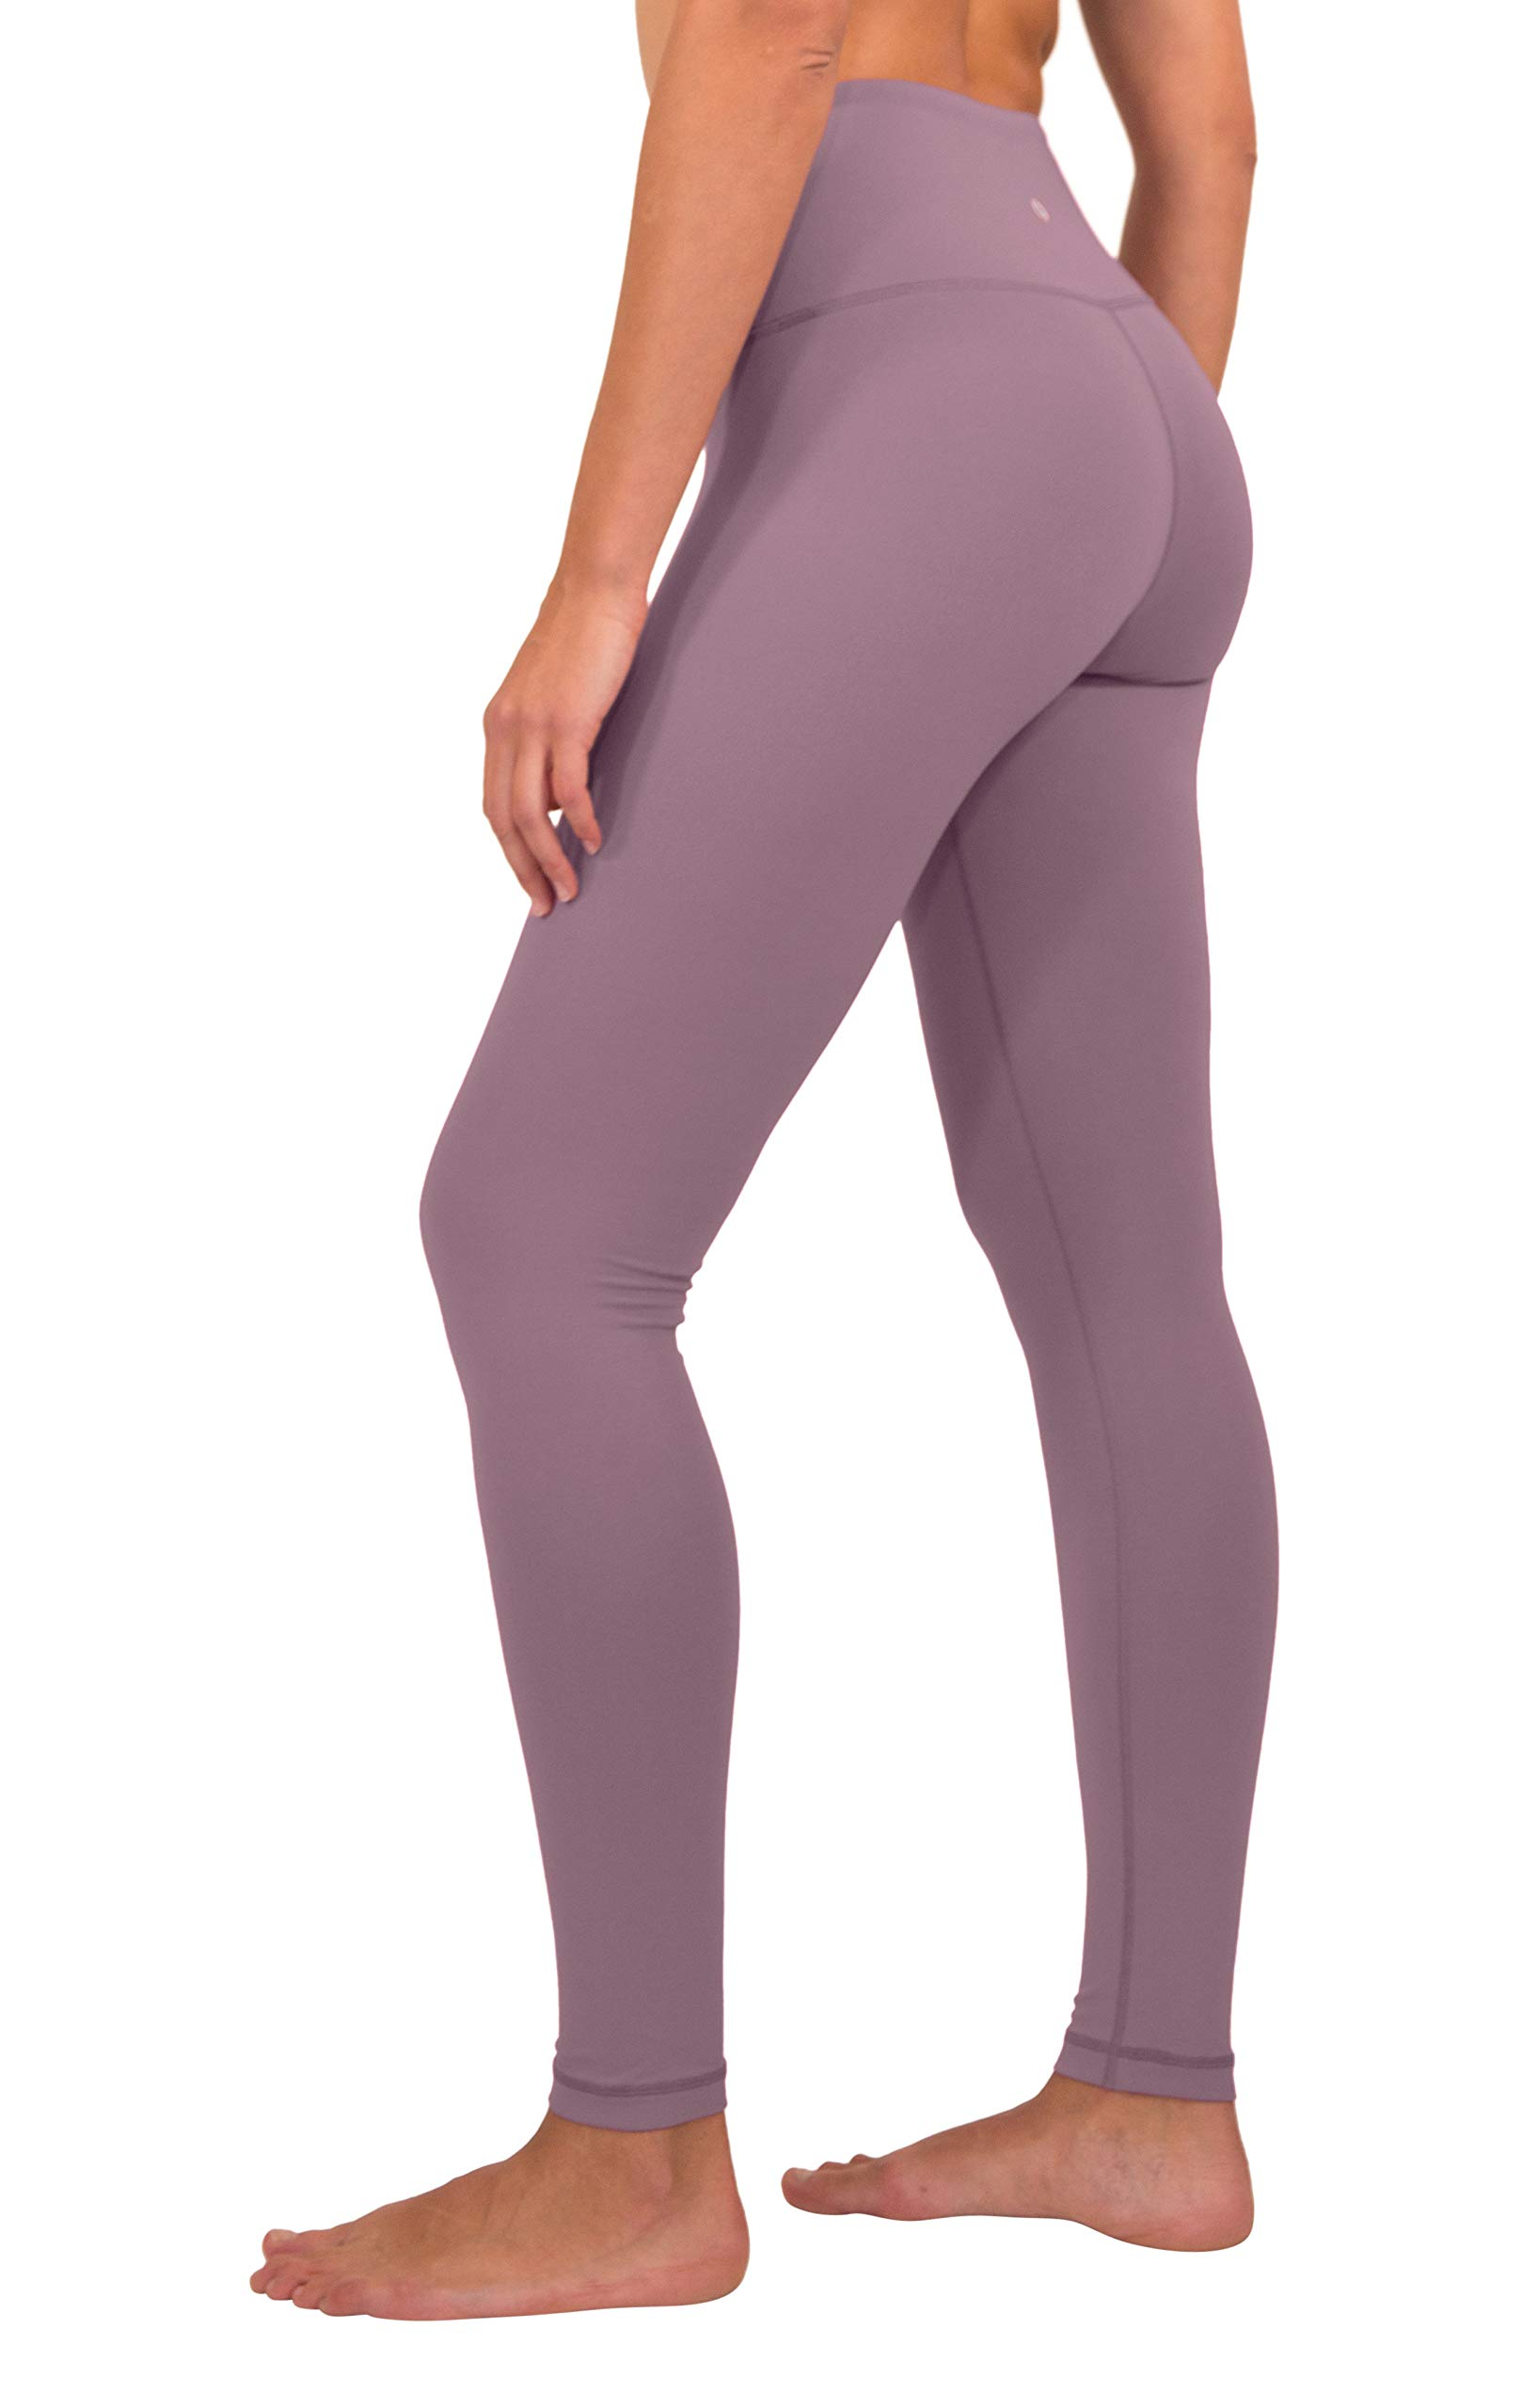 90 Degree By Reflex - High Waist Power Flex Legging – Tummy Control - Chocolate Plum - Small by 90 Degree By Reflex (Image #2)